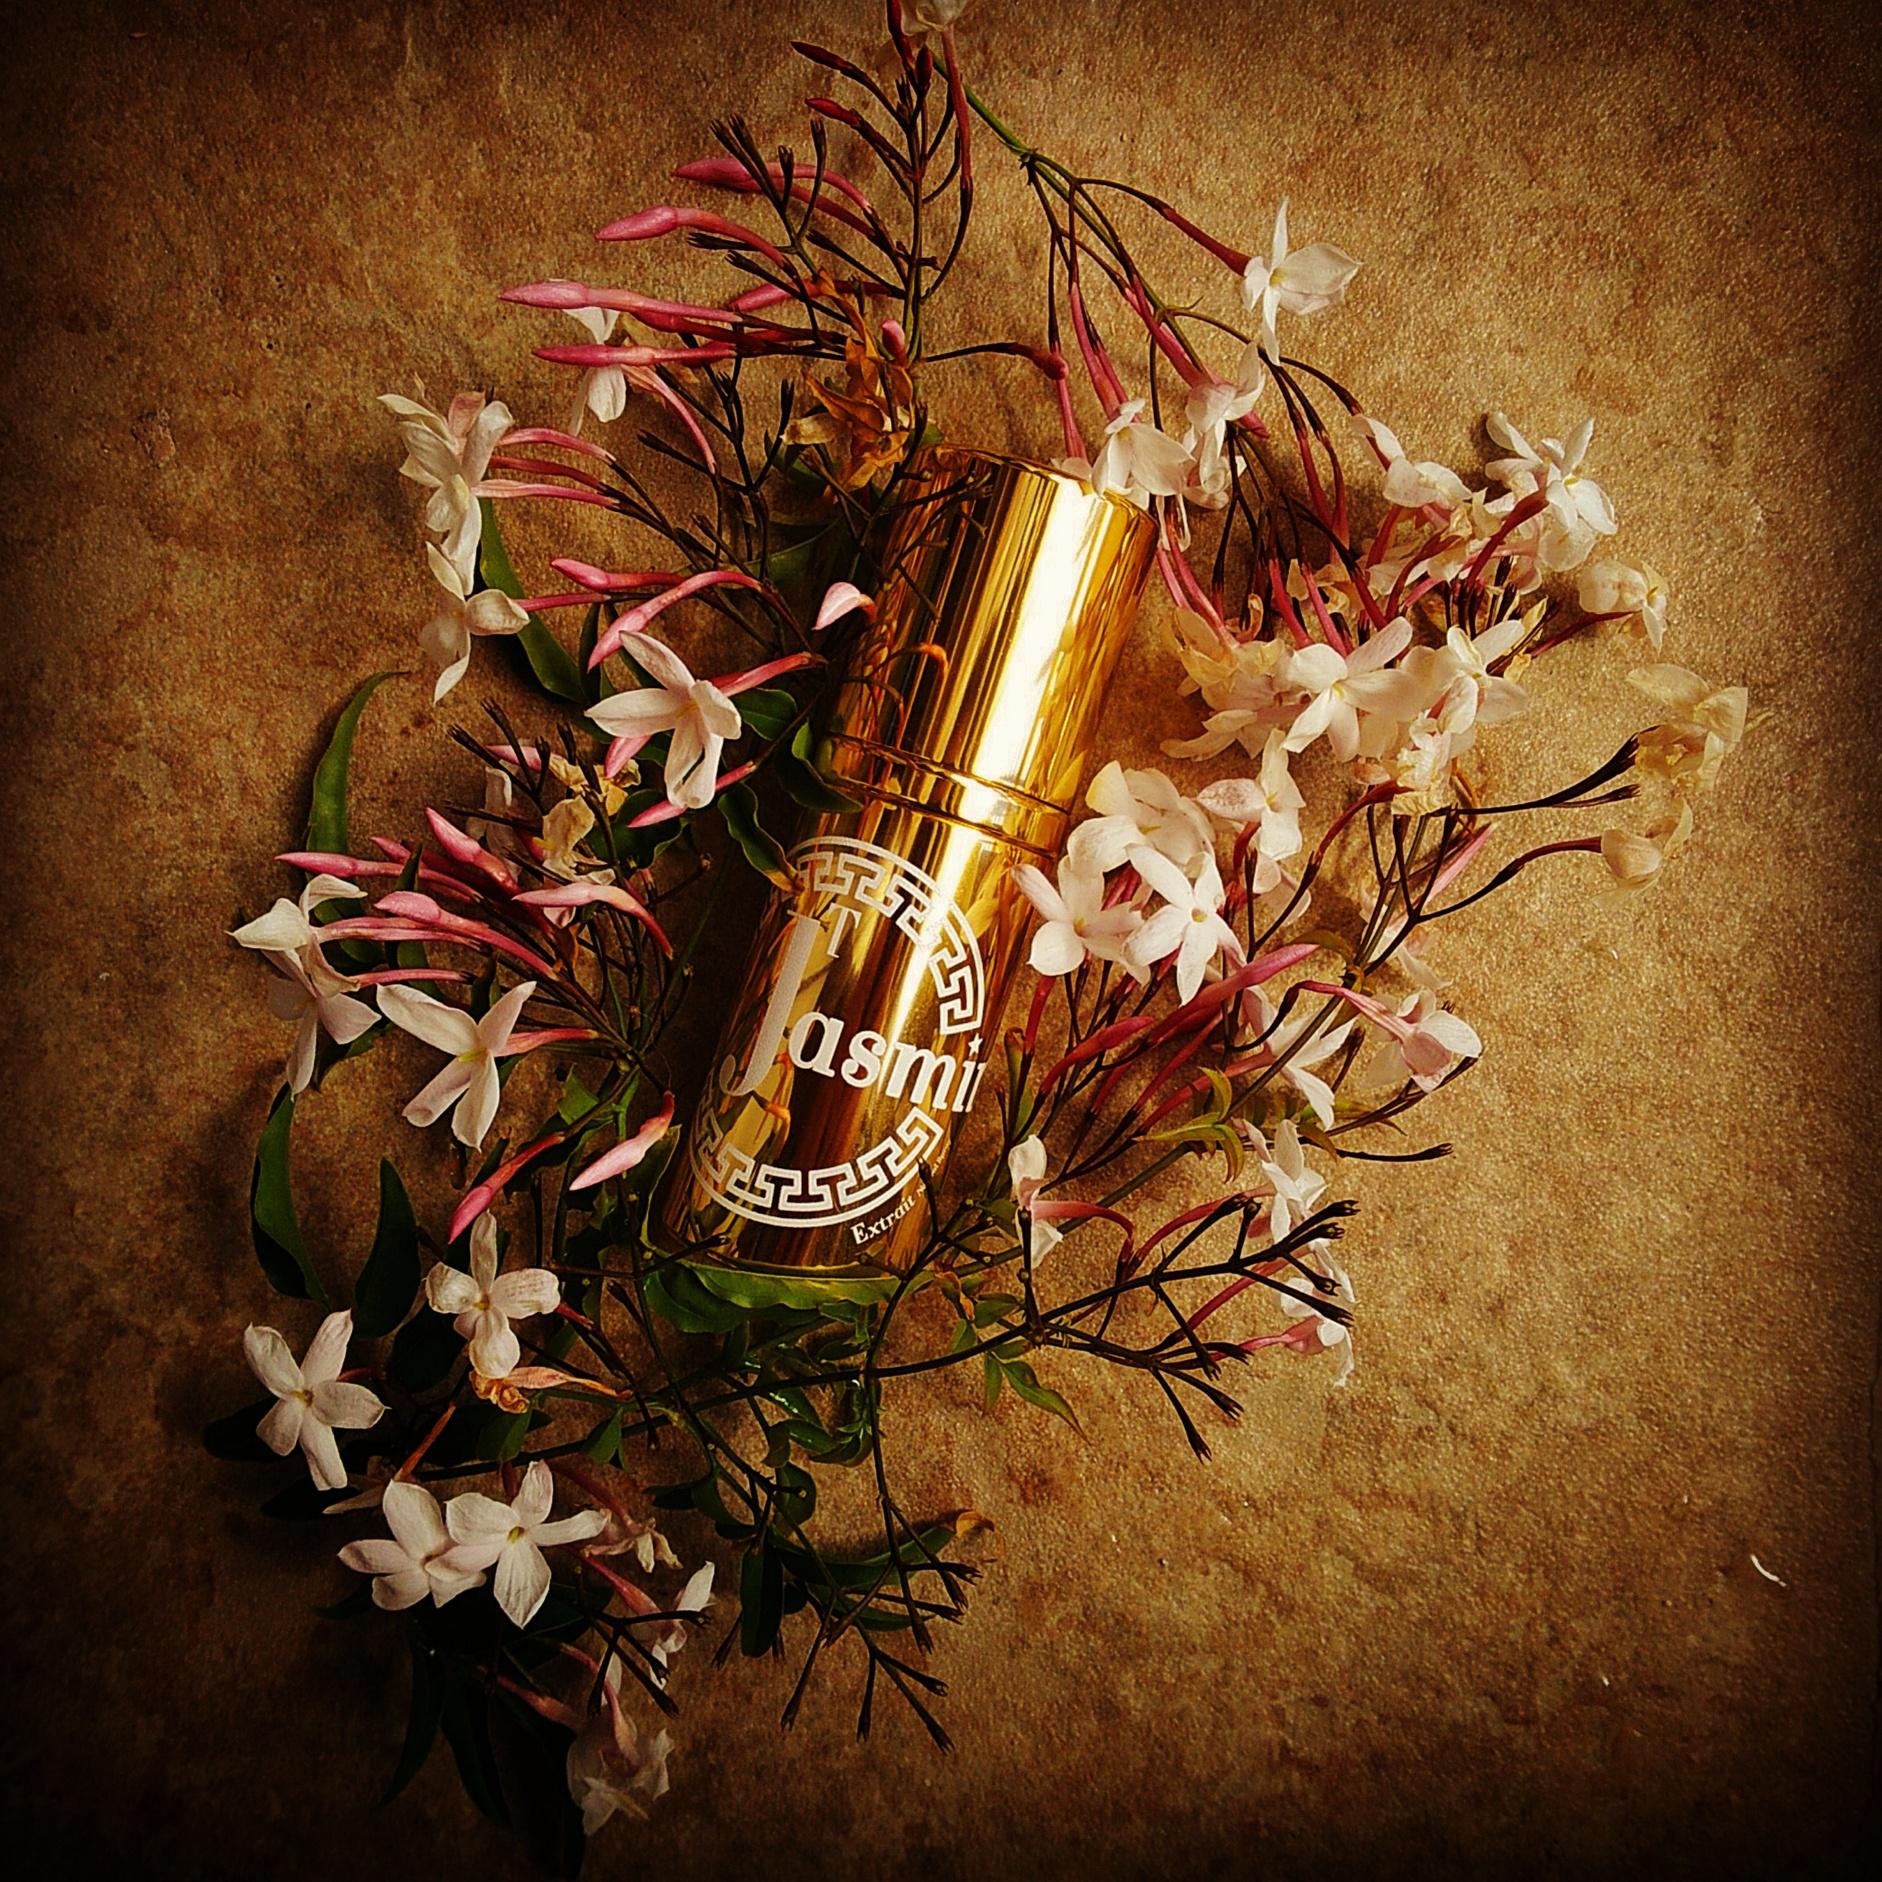 Bruno acampora jasmin t portrait of a flower fragrance reviews jasmin t bruno acampora dhlflorist Images